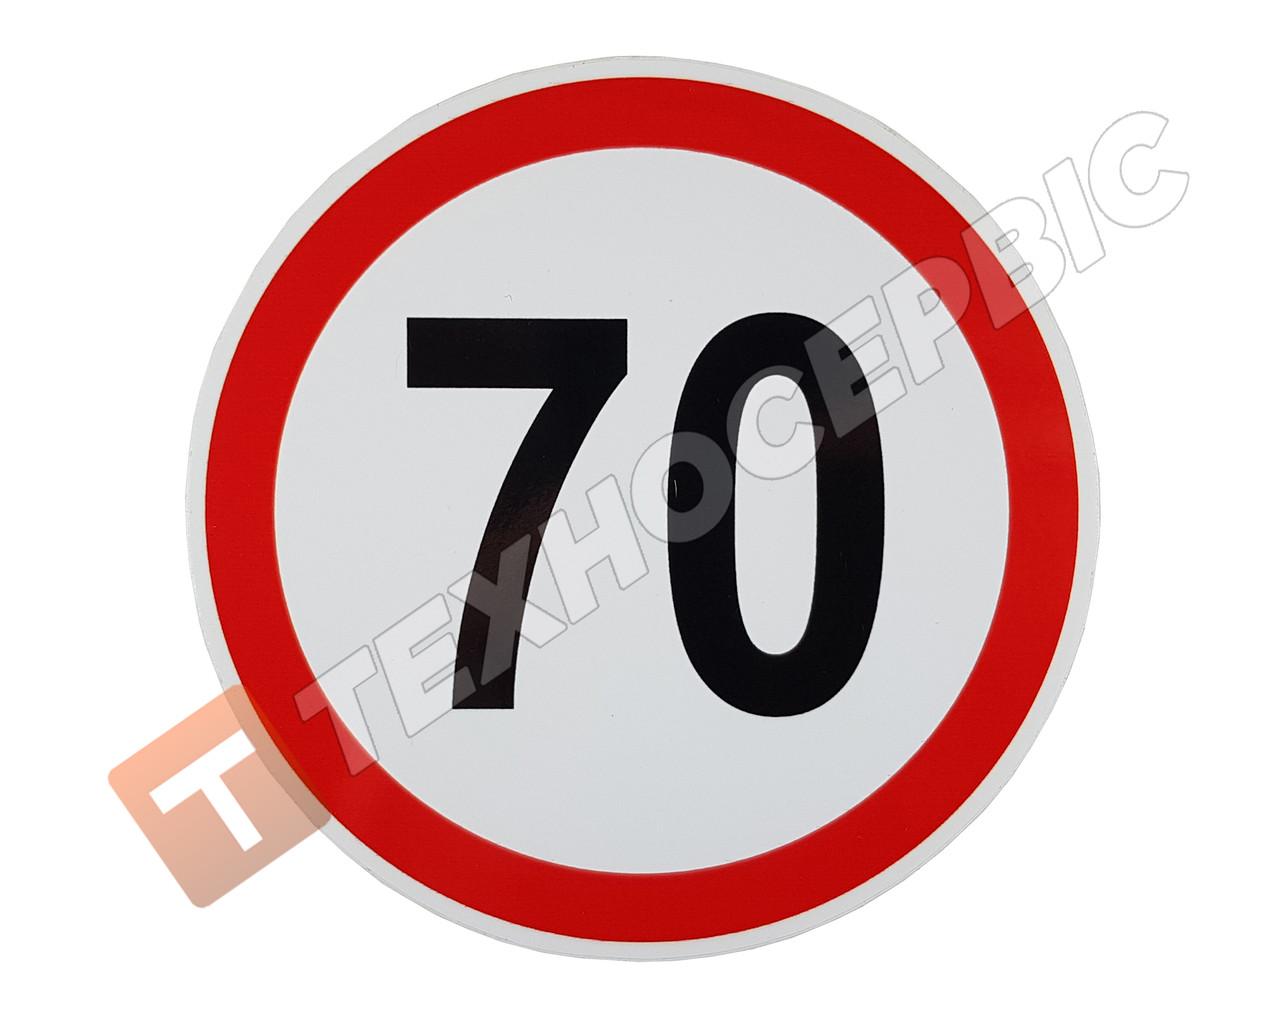 Наклейка знак 70 км размер (диаметр)160мм